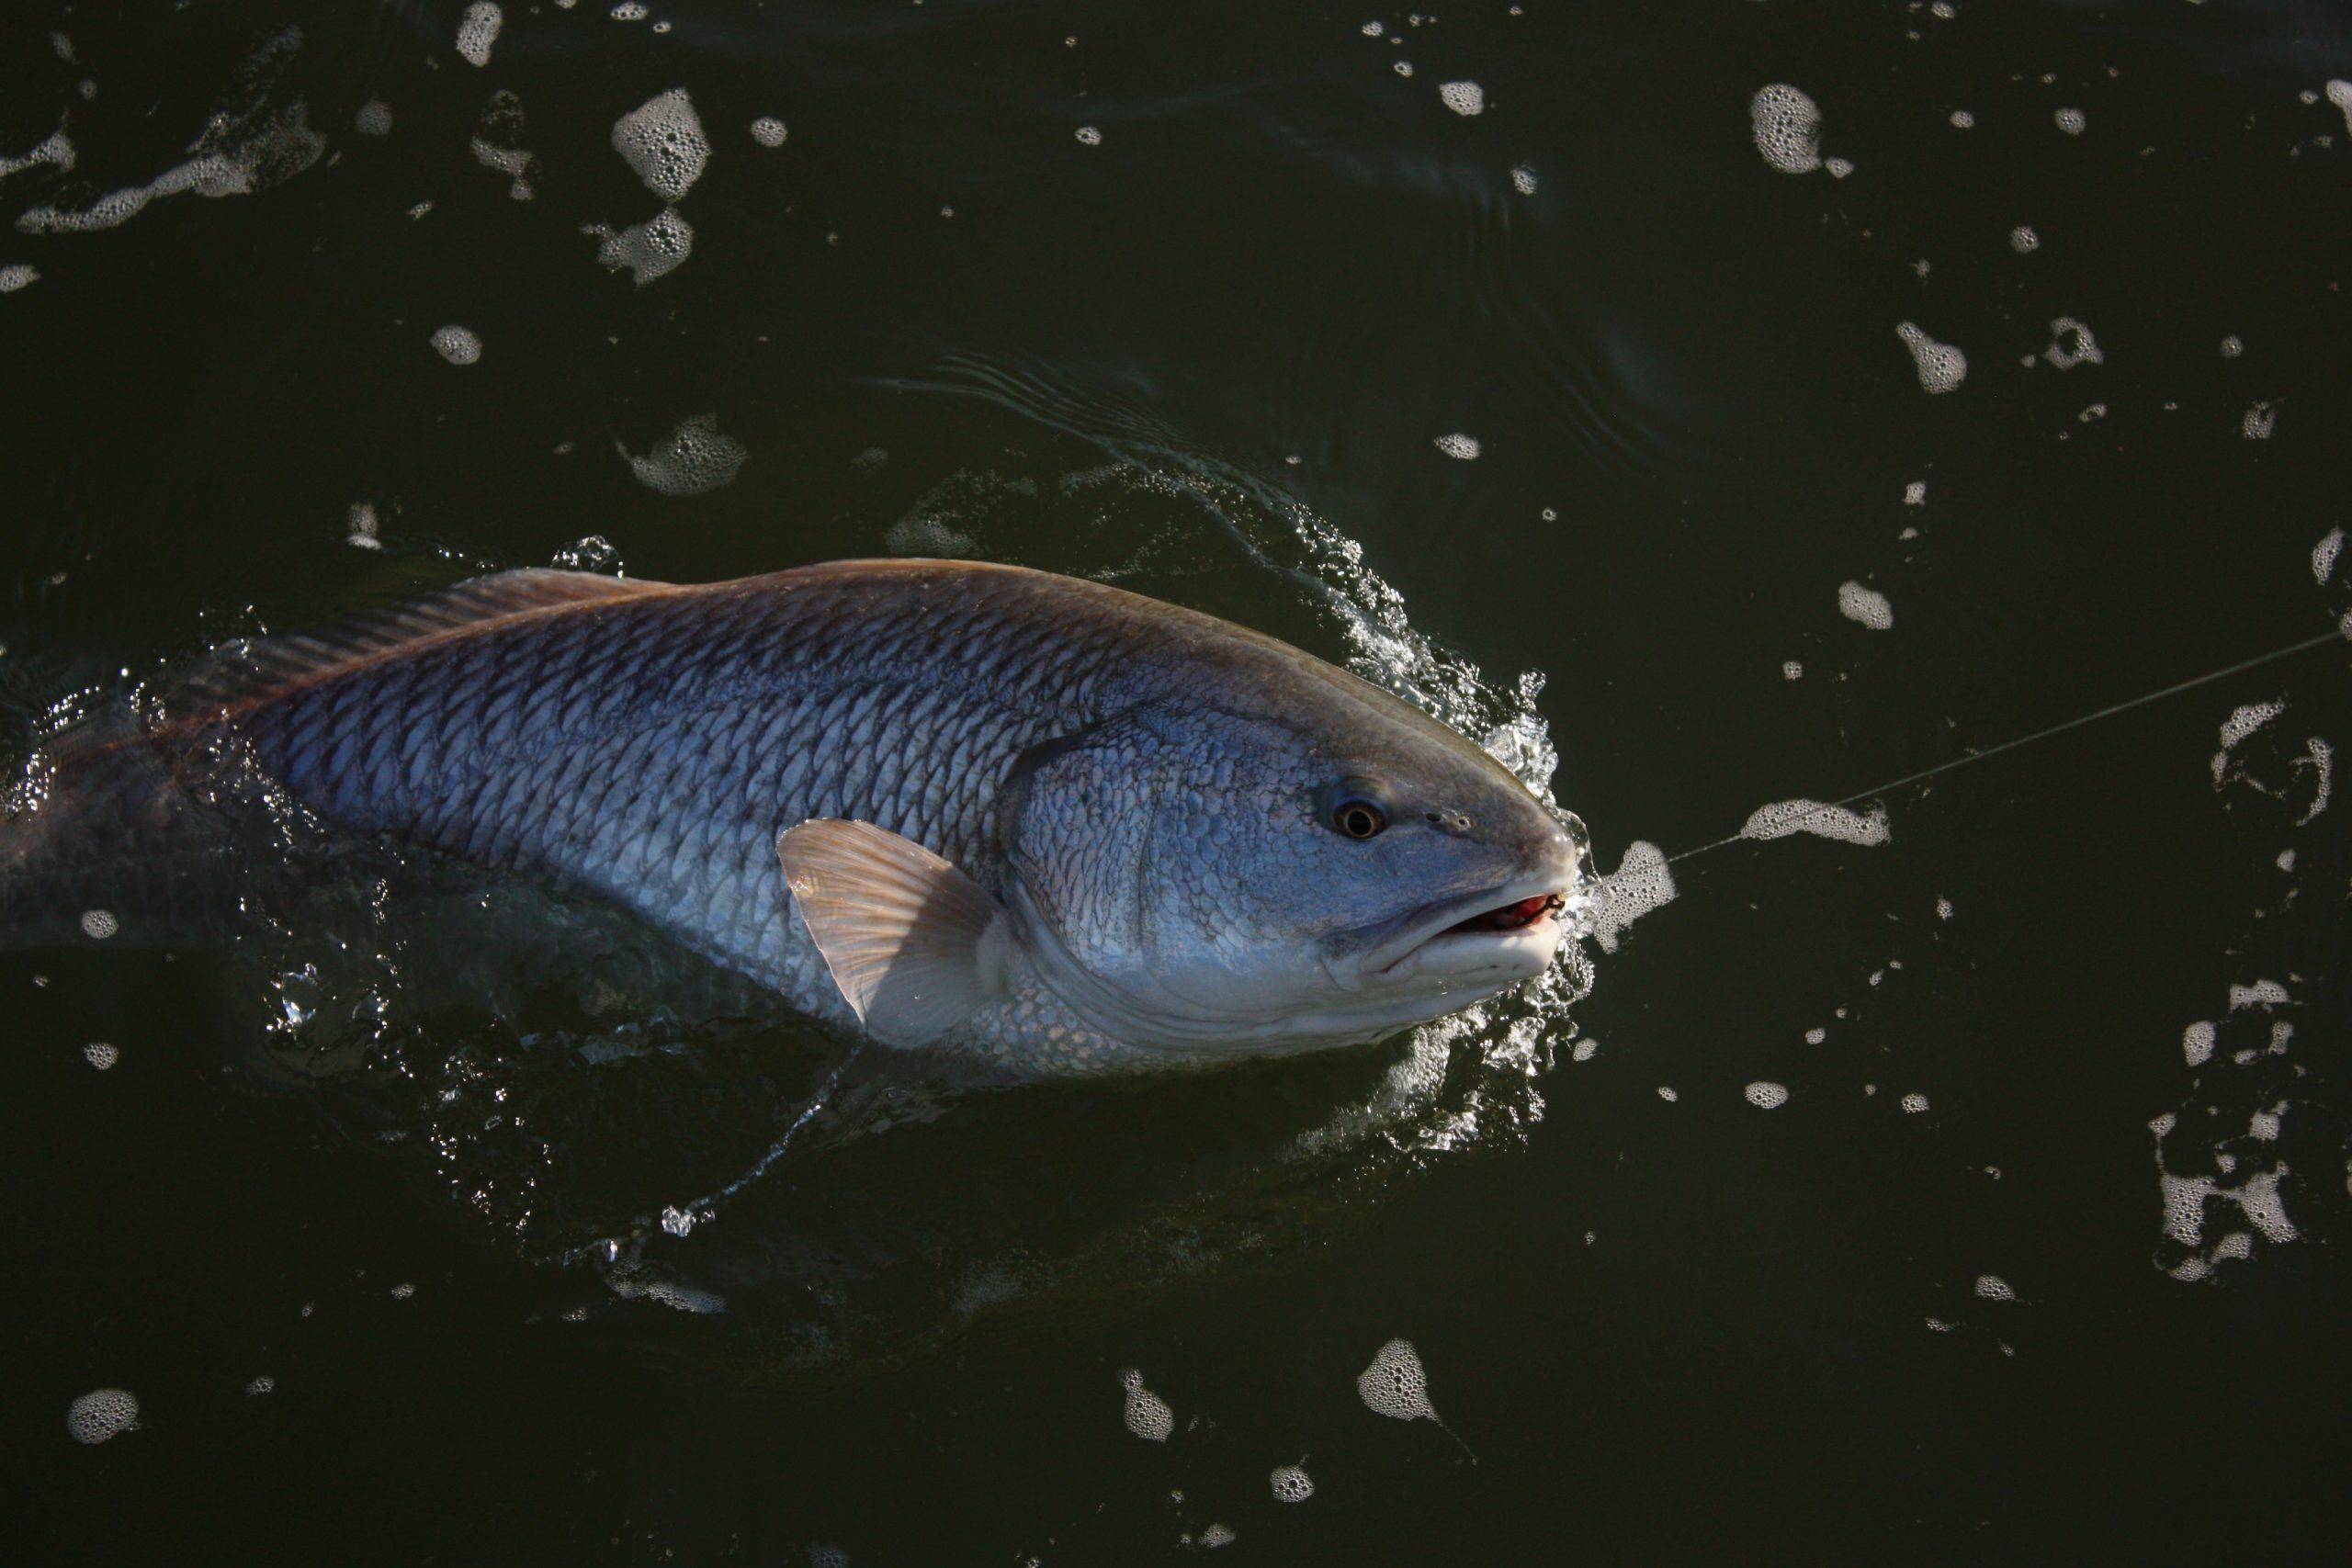 redfish season